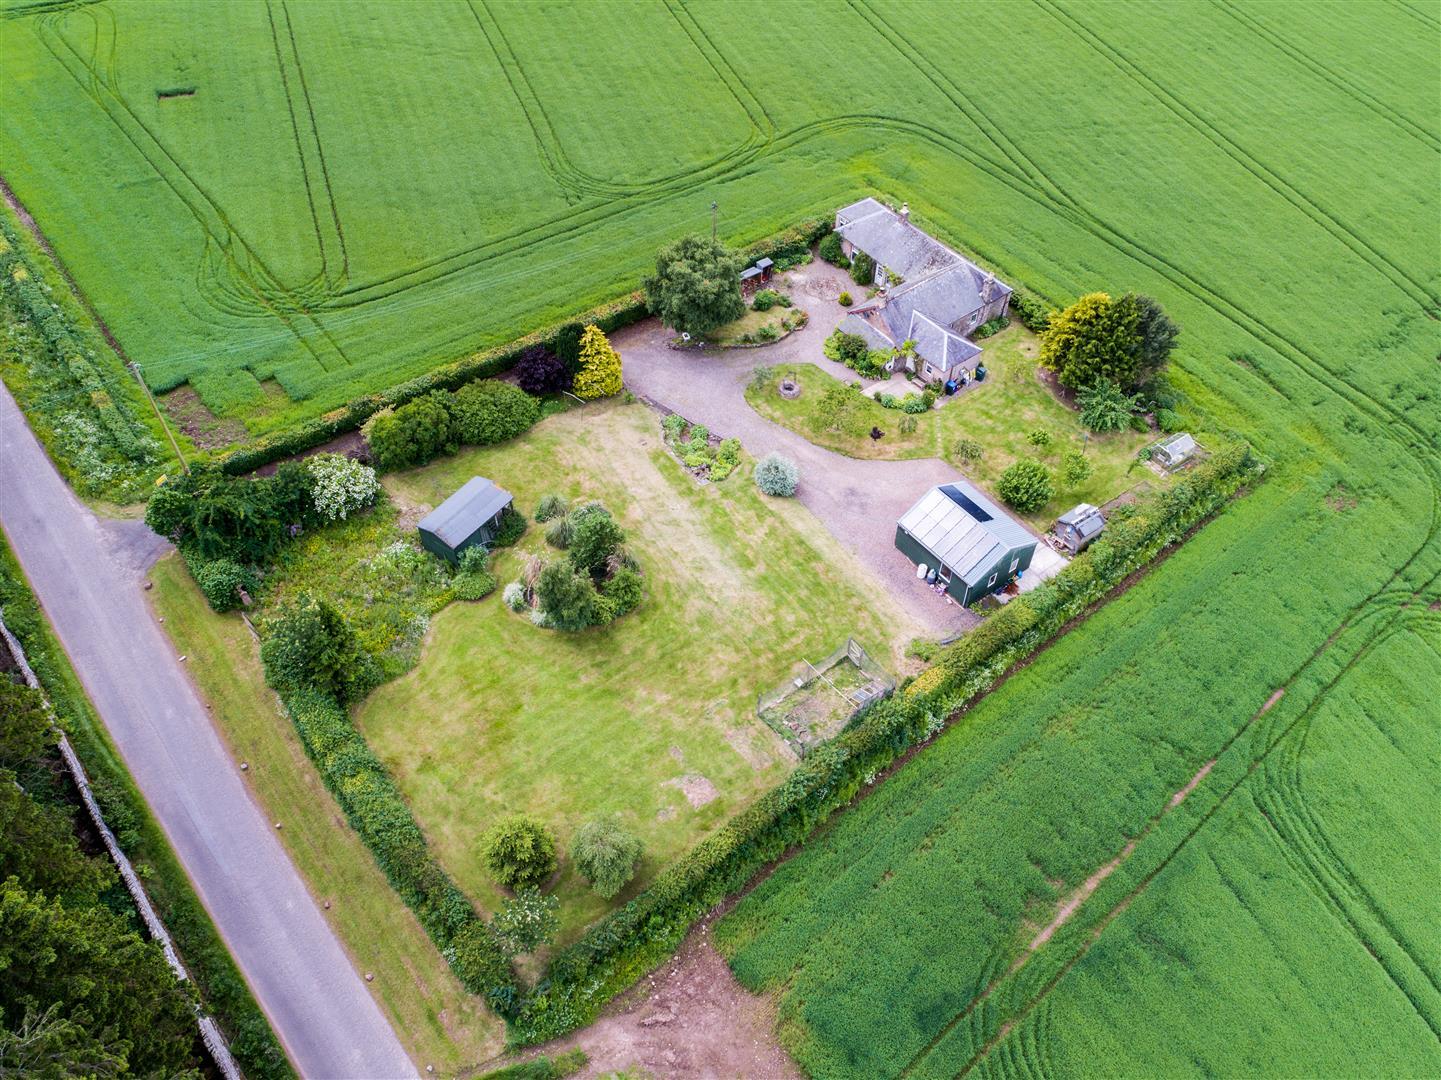 Broomend, Meigle, Blairgowrie, Perthshire, PH12 8TE, UK